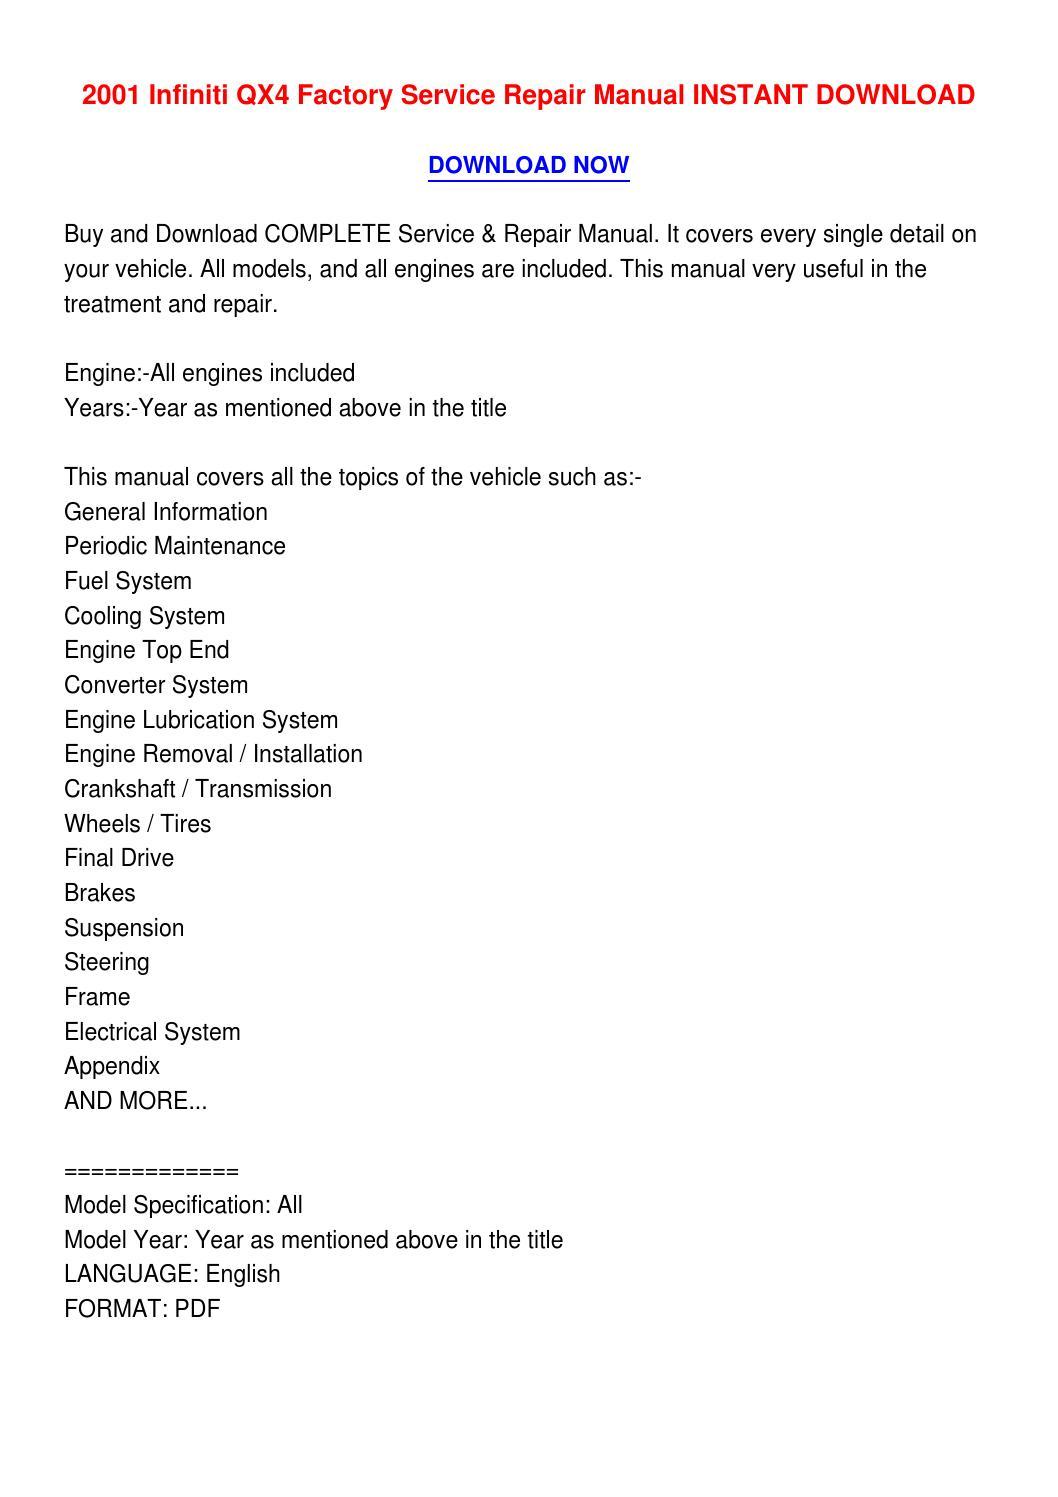 2001 Infiniti Qx4 Factory Service Repair Manual Instant